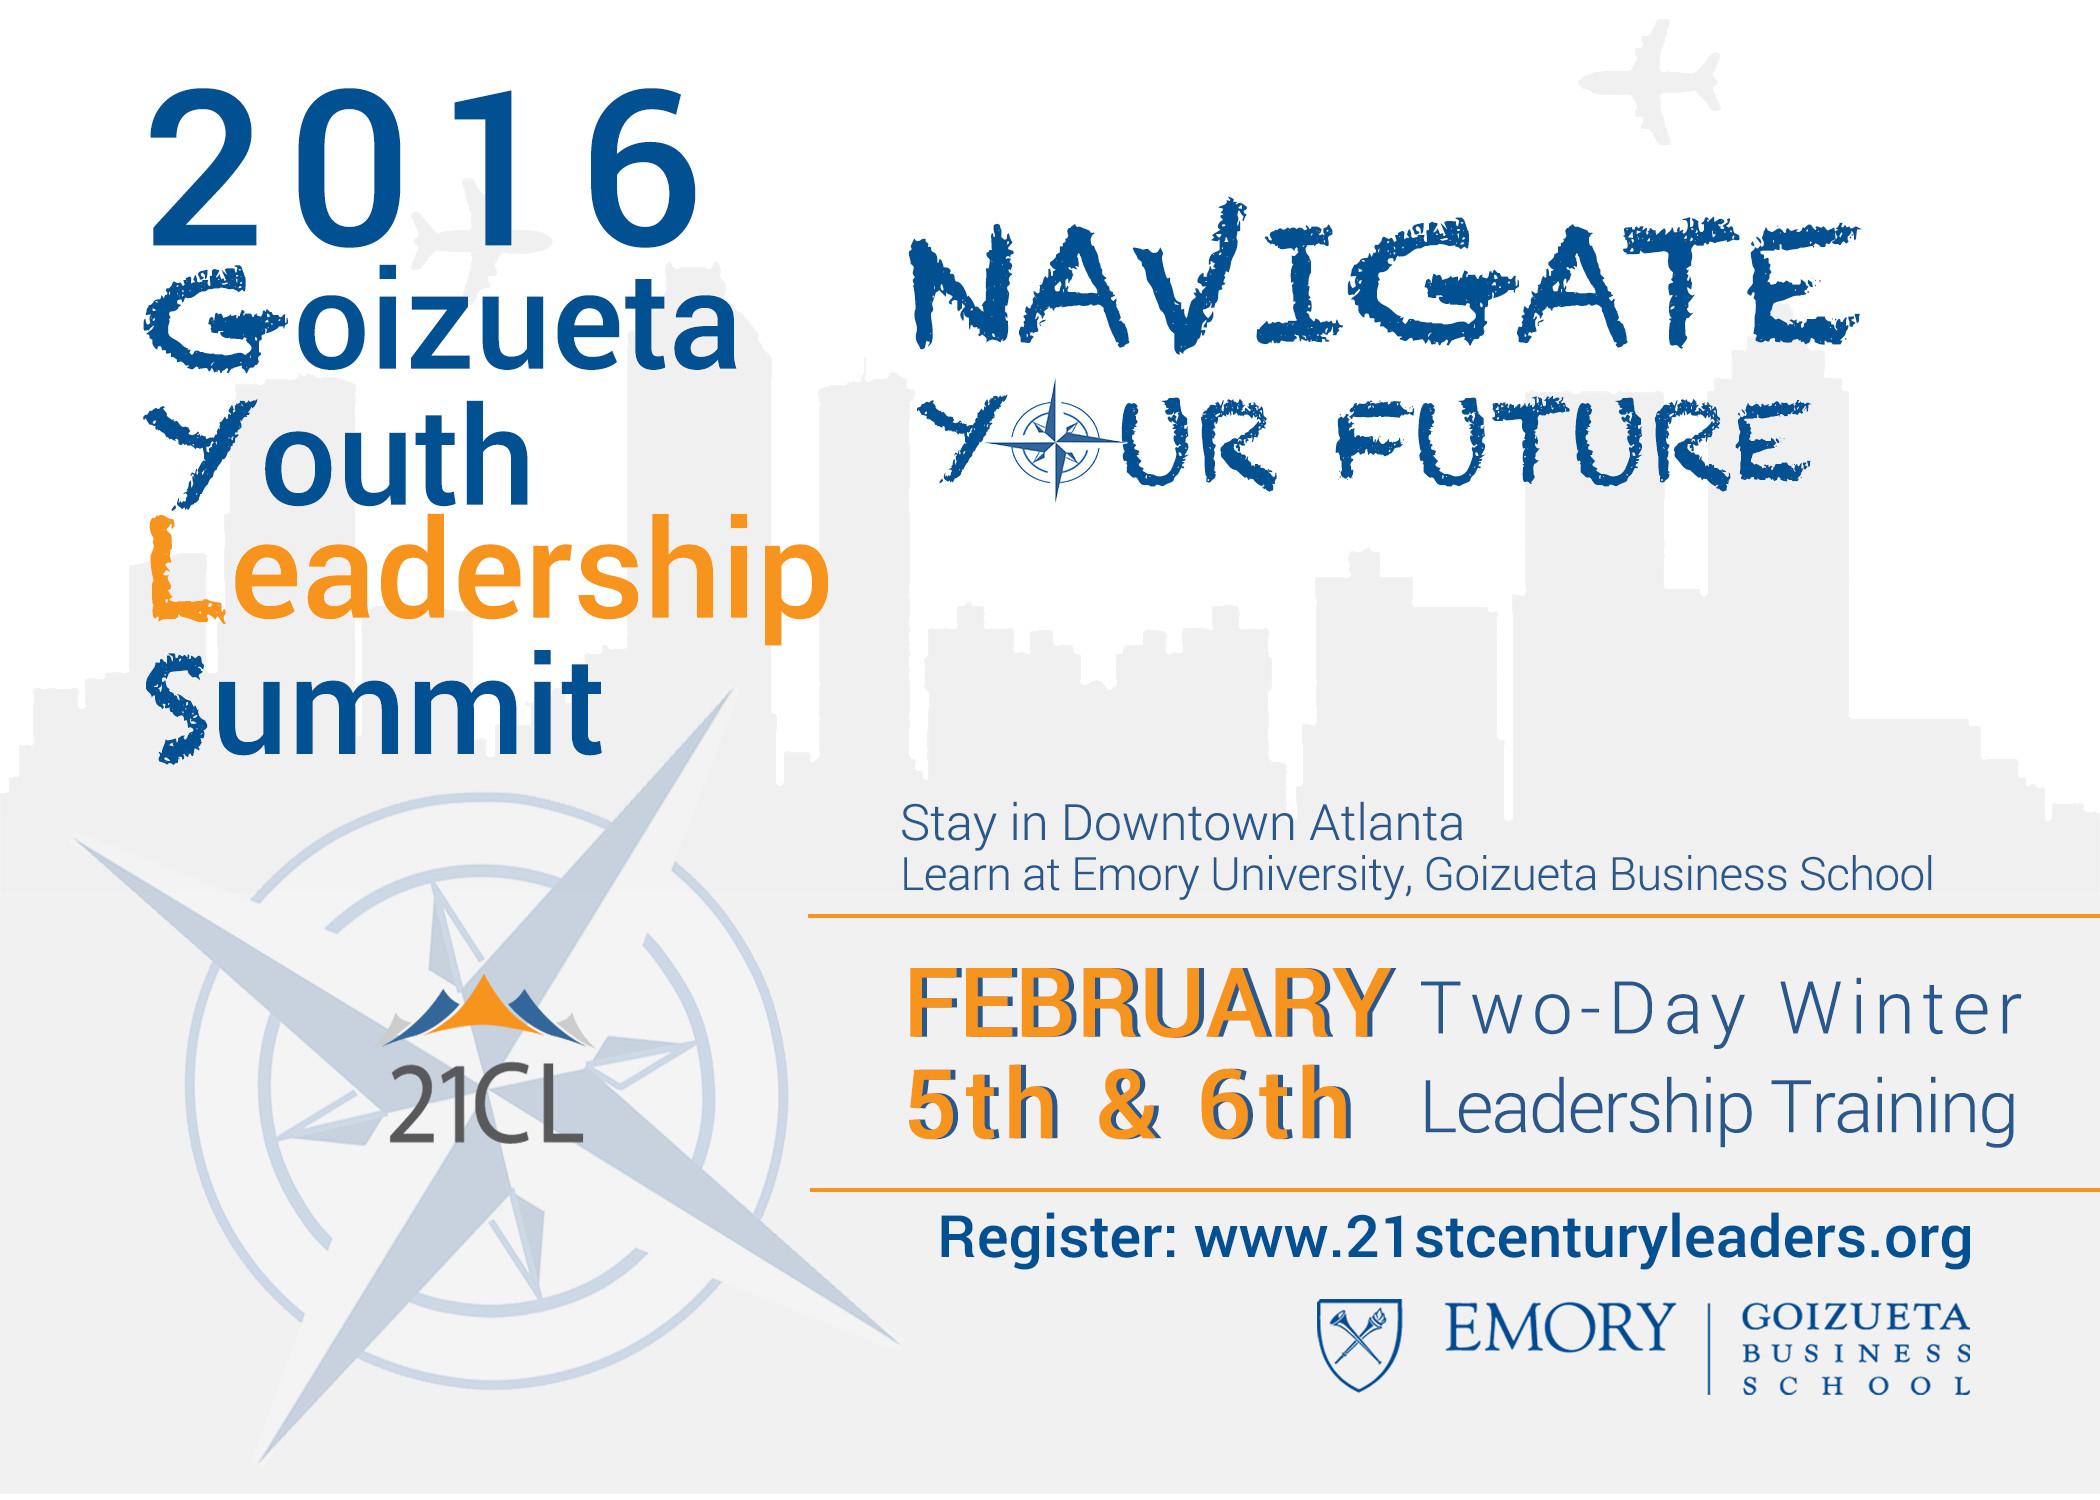 goizueta youth leadership summit 21st century leaders